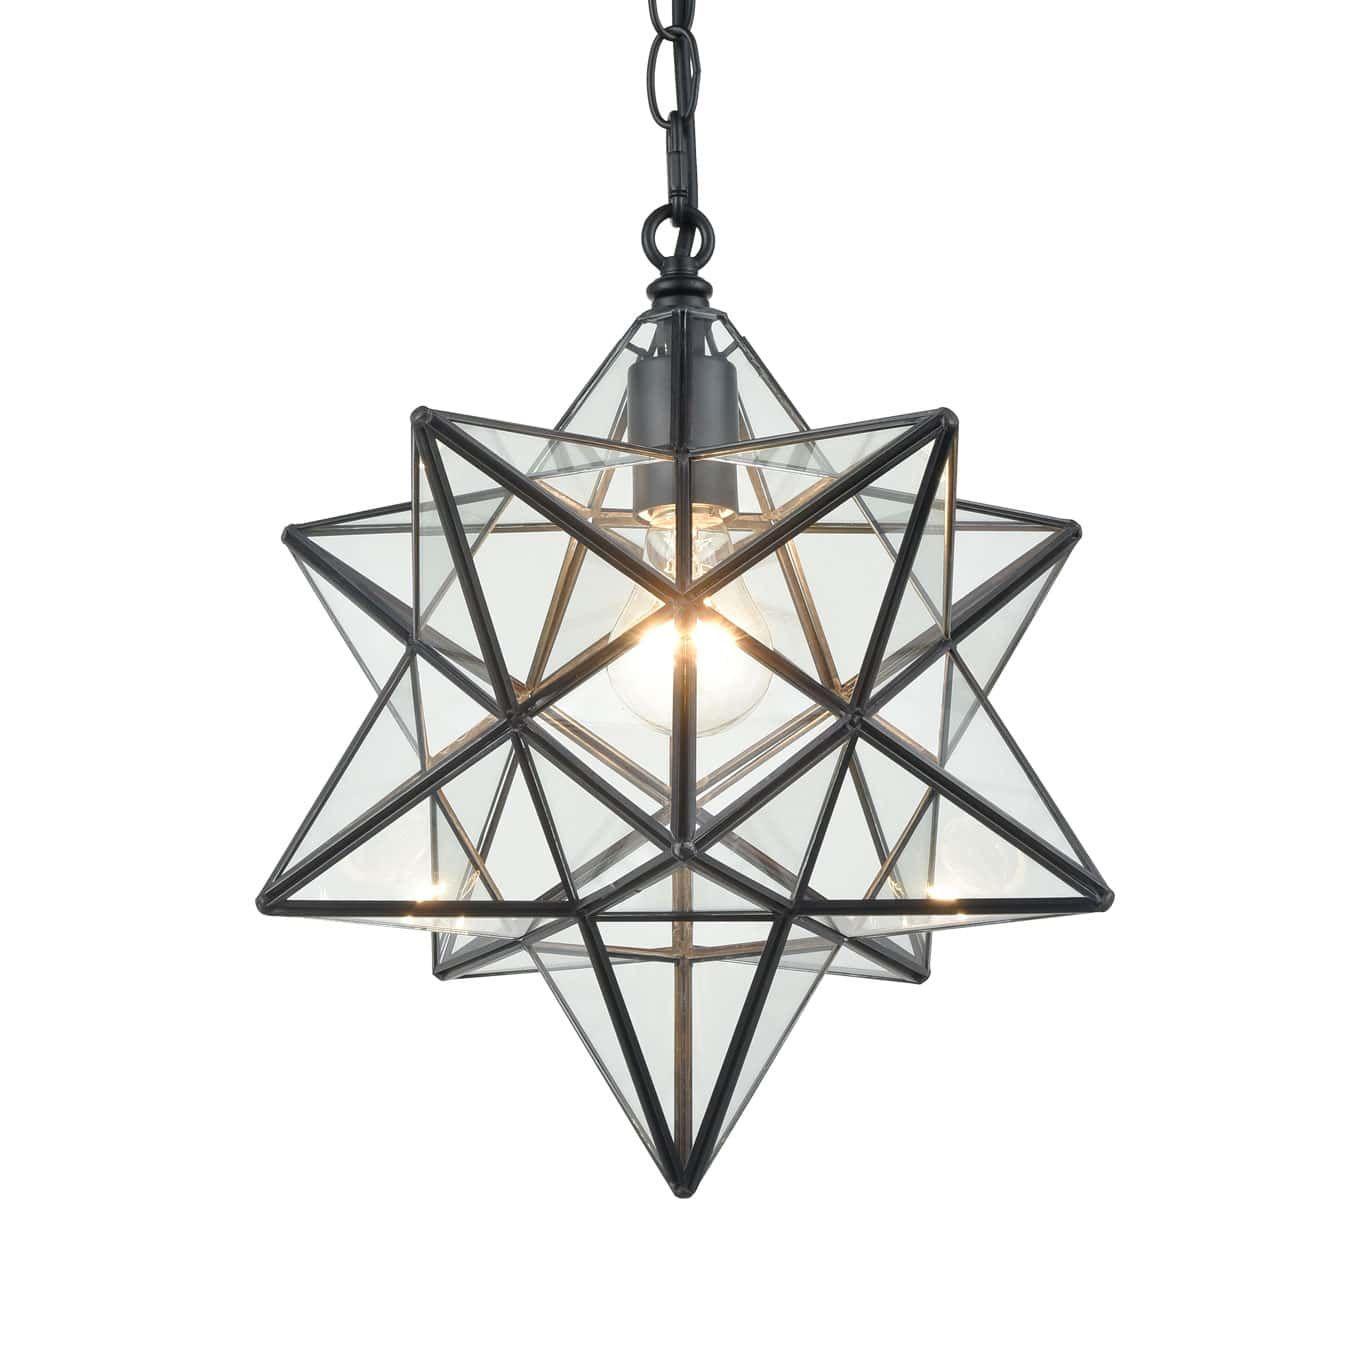 Superior Moravian Star Light In 2021 Moravian Star Light Star Light Shade Star Pendant Lighting